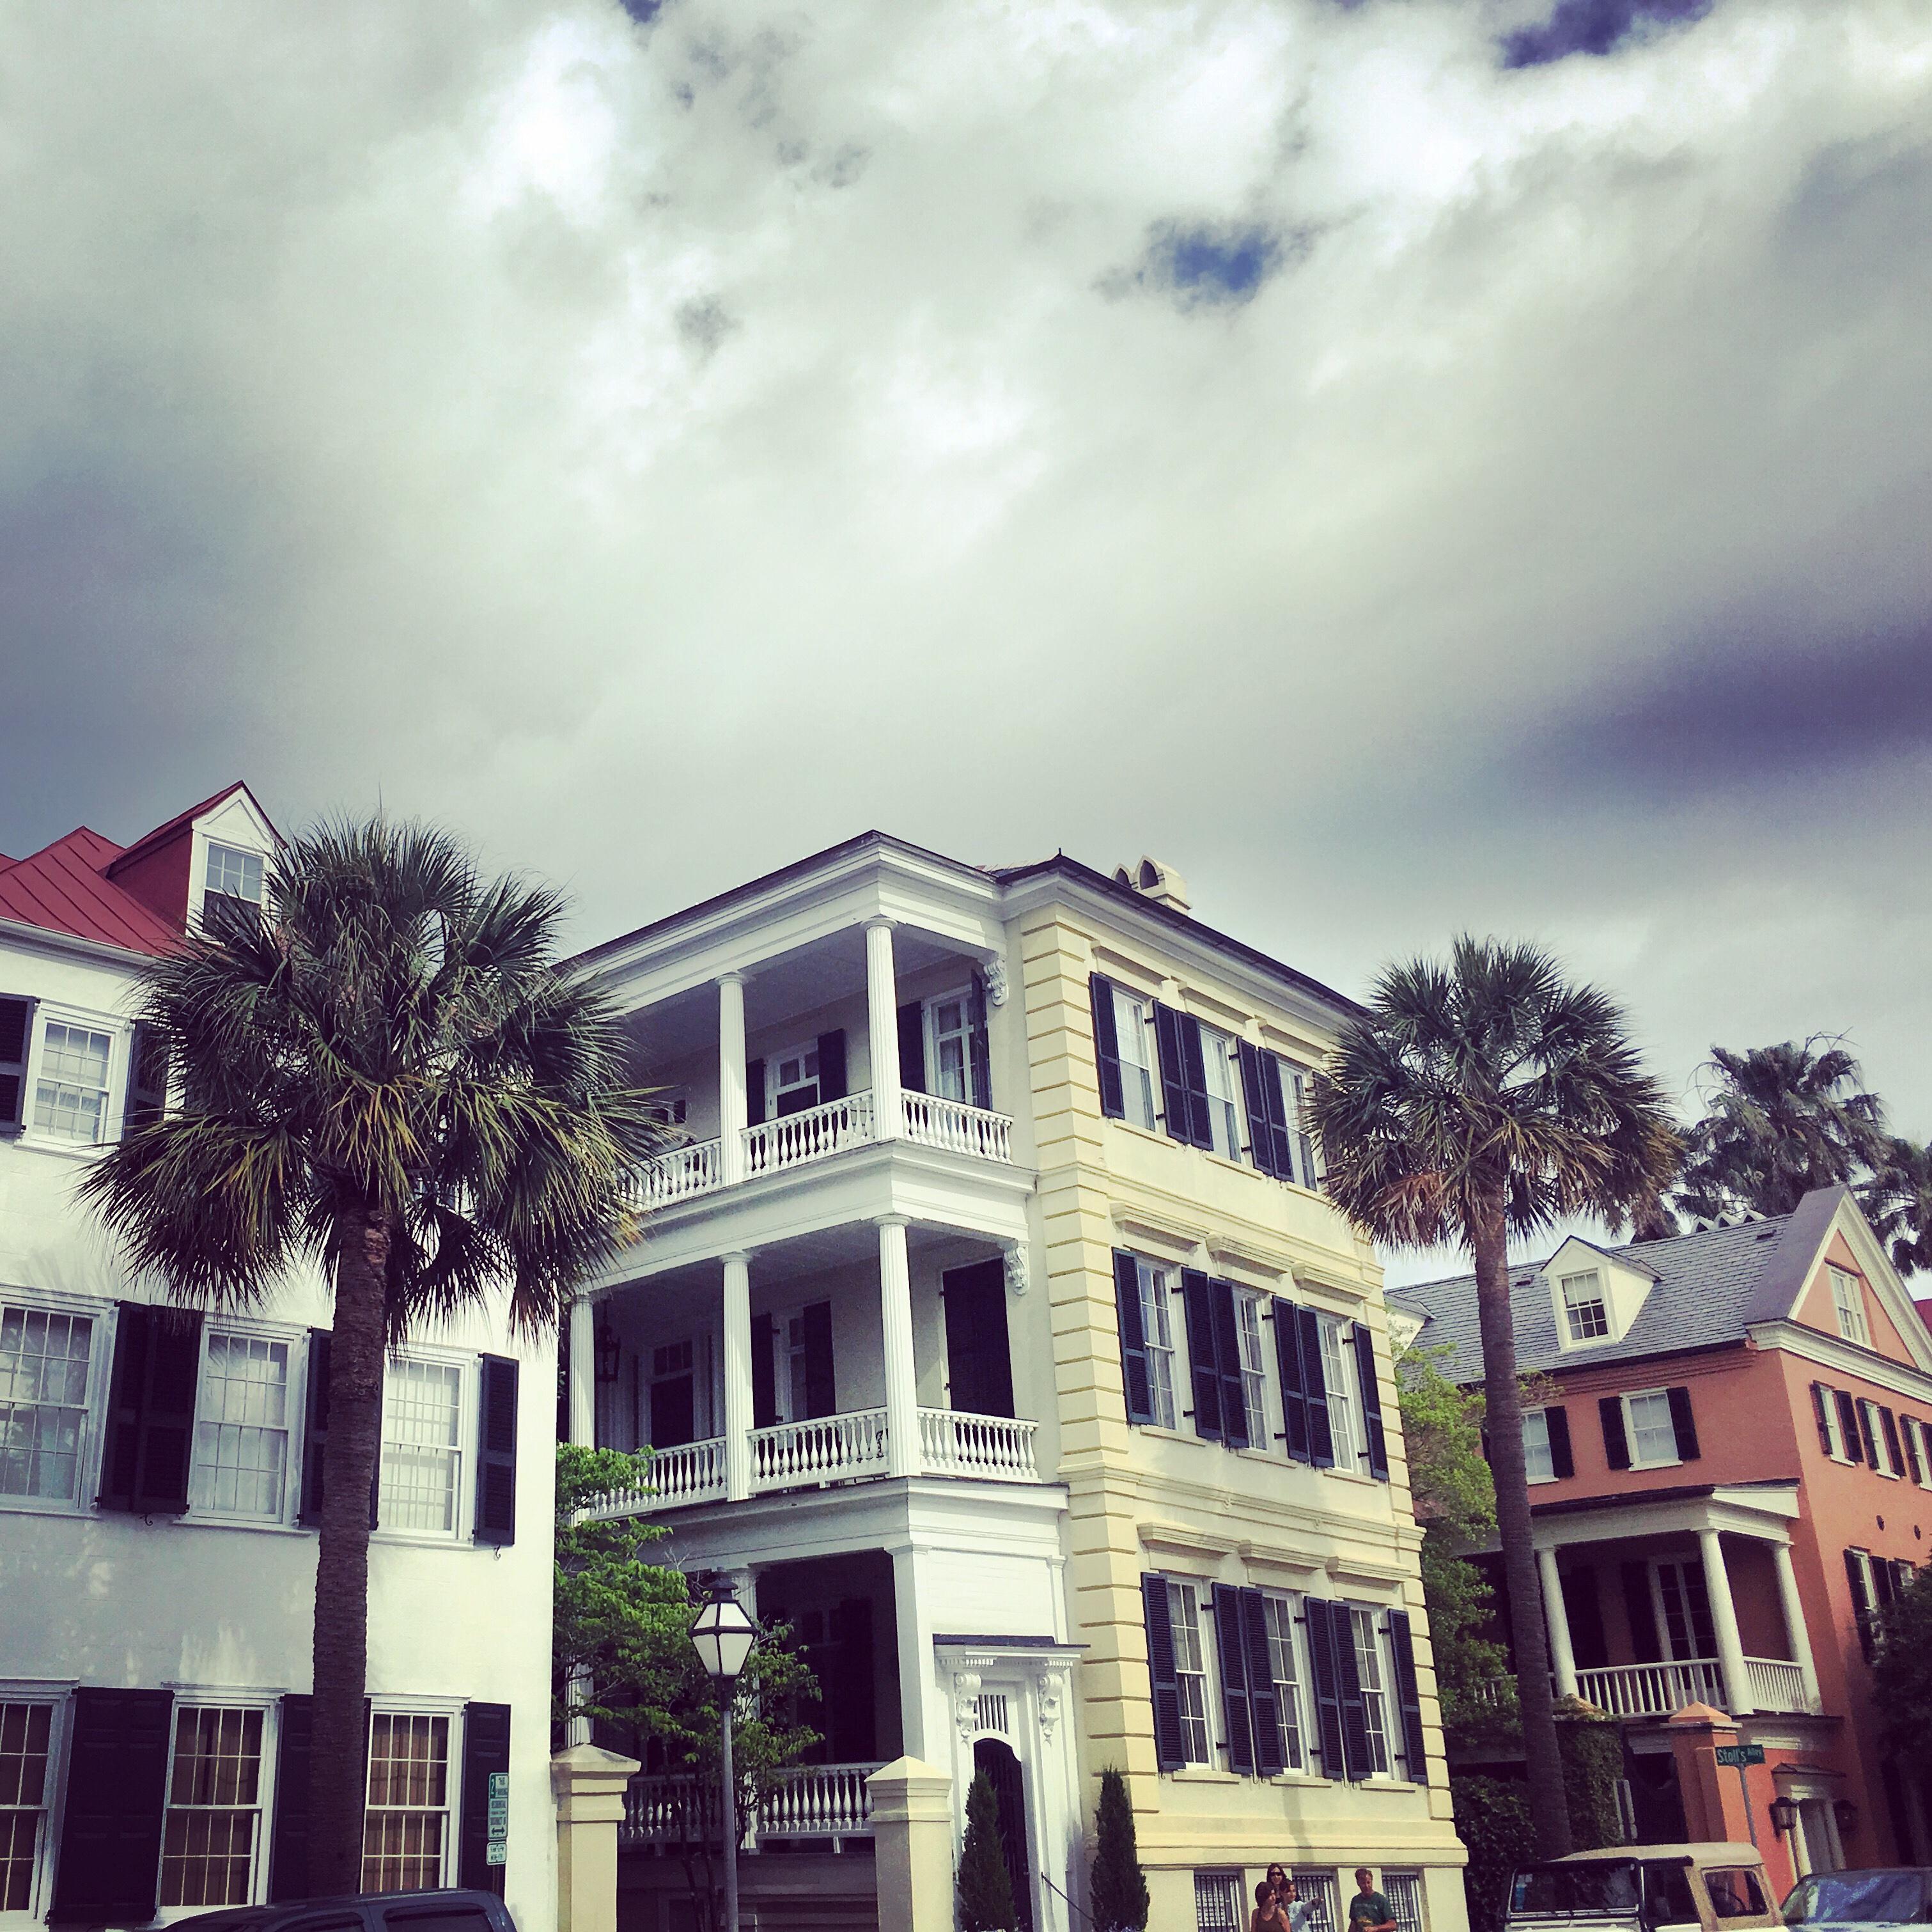 Checking off Charleston!